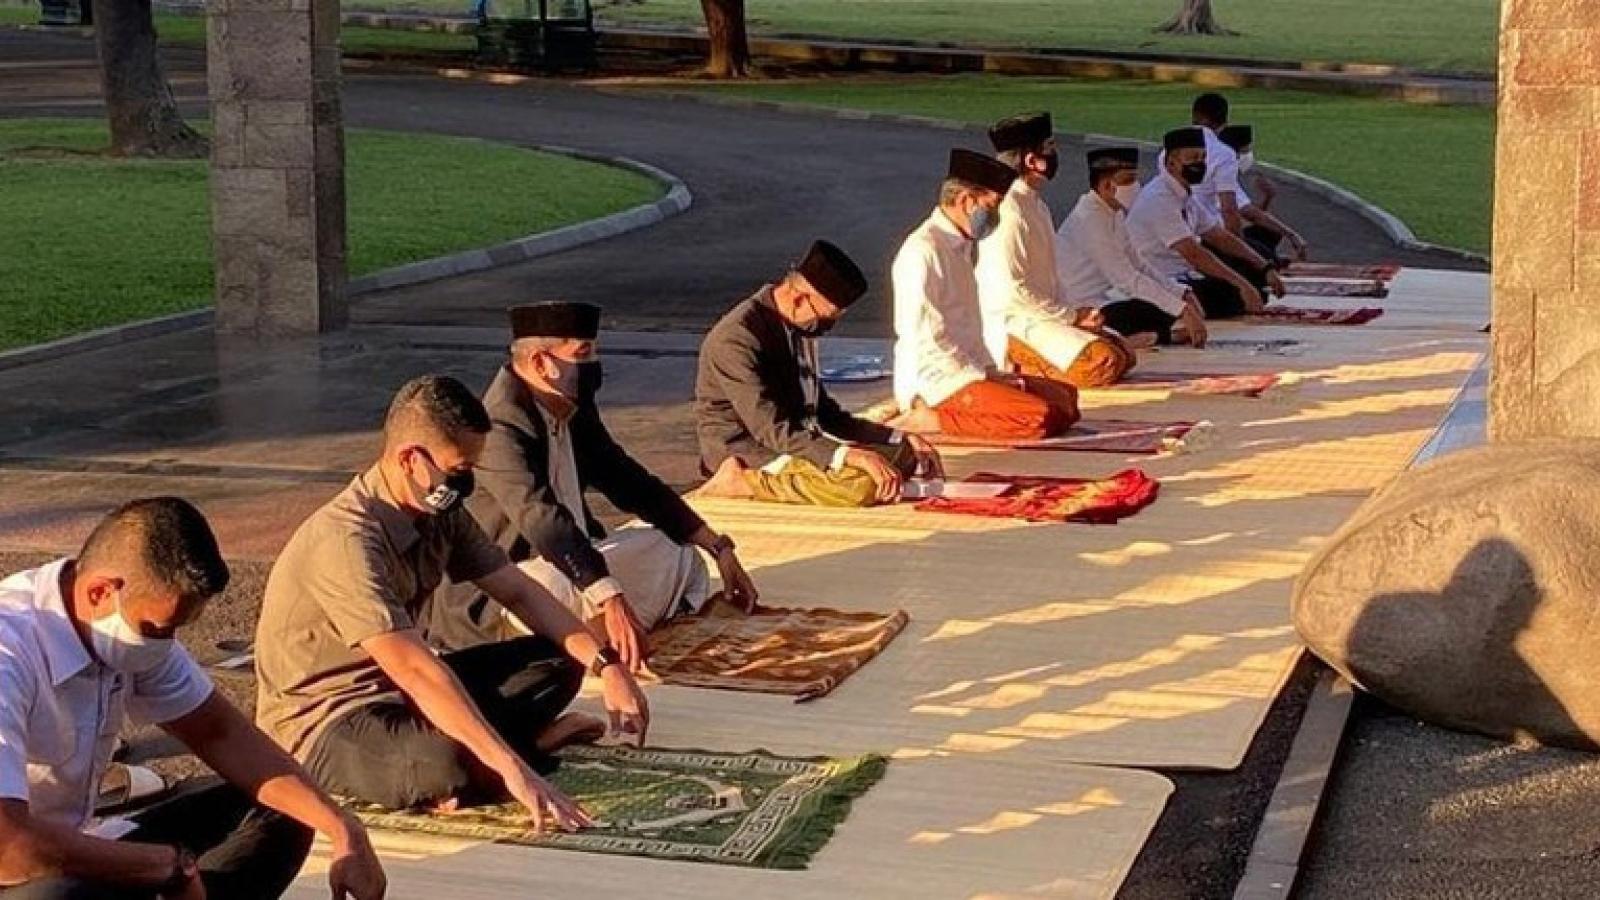 Indonesia đón lễ hiến sinh Eid Al-Adha giữa đại dịch Covid-19